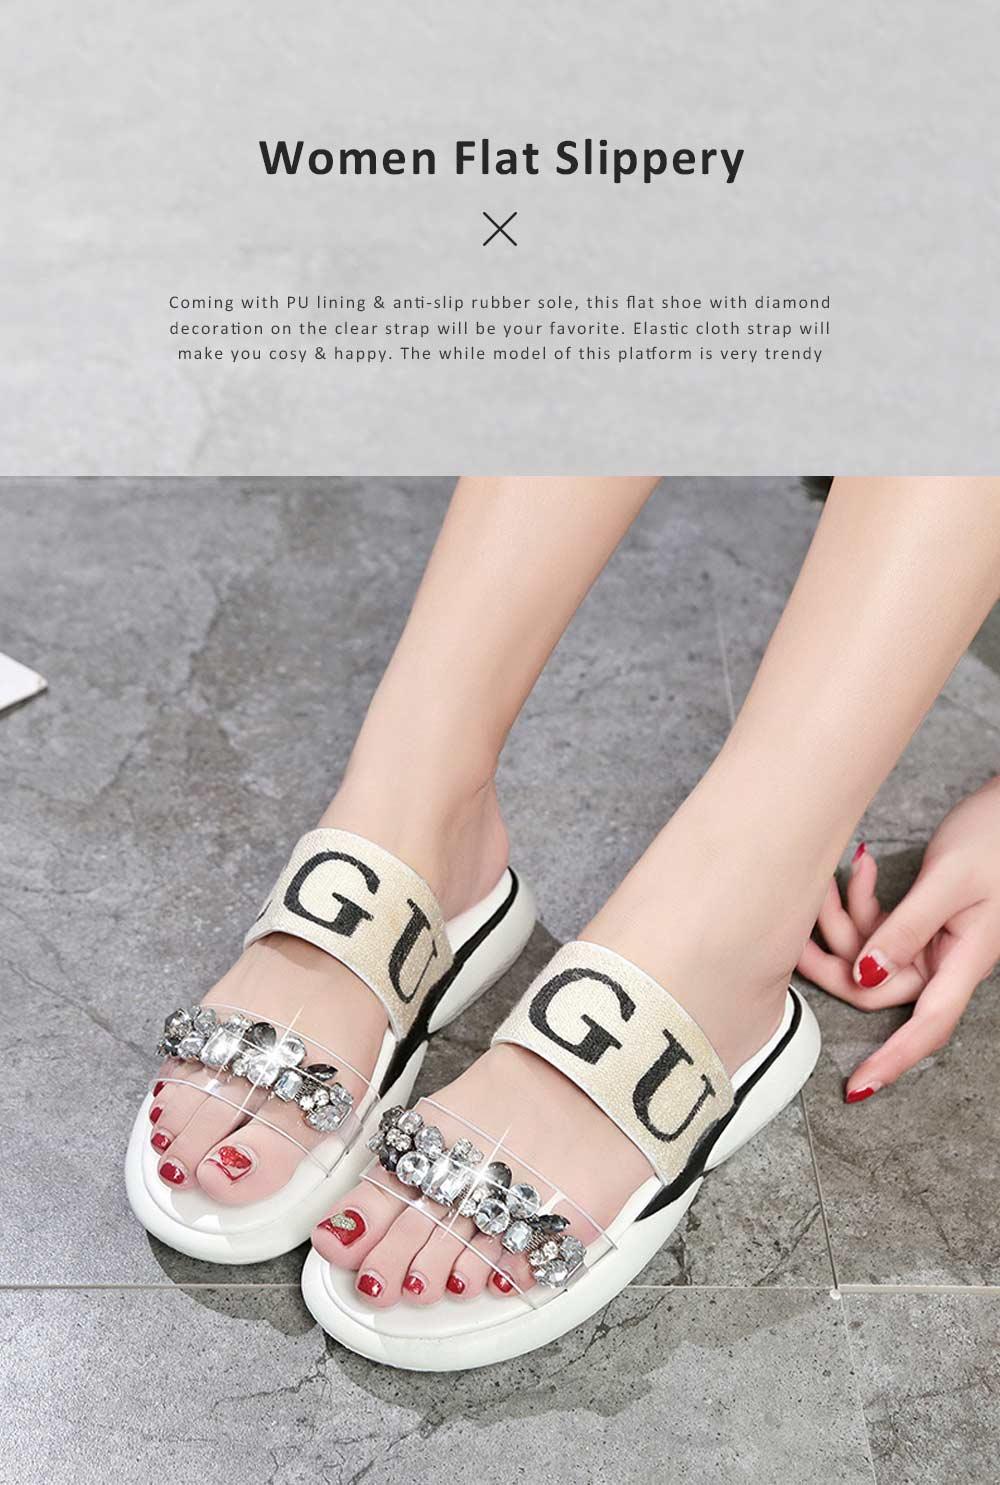 Women Summer Flat Slippery PU Rubber Comfortable Shoe Clear Diamond Elastic Strap Platform Shoe 0